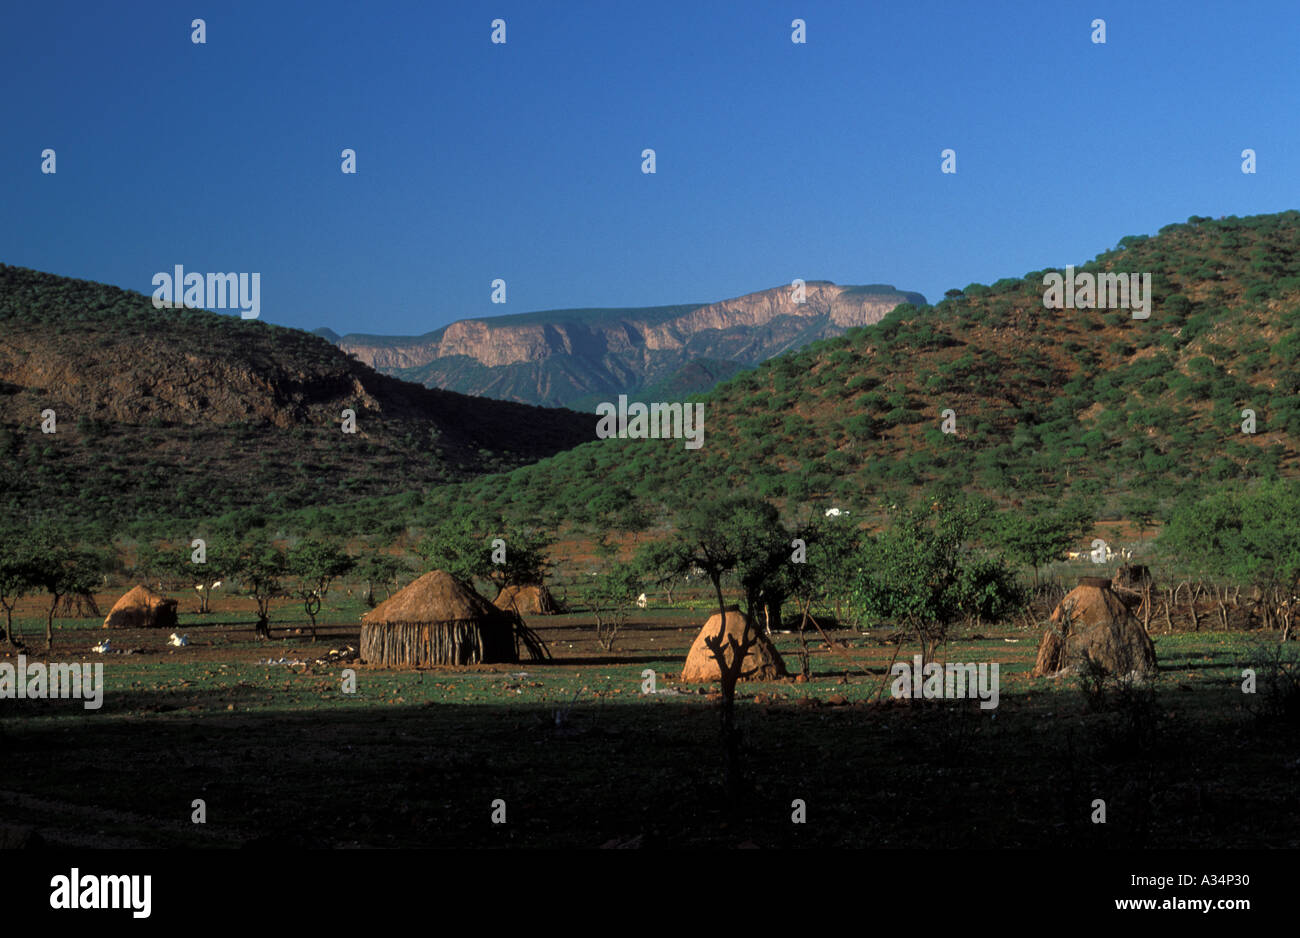 Huts inside Kraal of Himba Ovahimba tibe people nocmadic rainy season Kaokoveld Namibia Africa - Stock Image